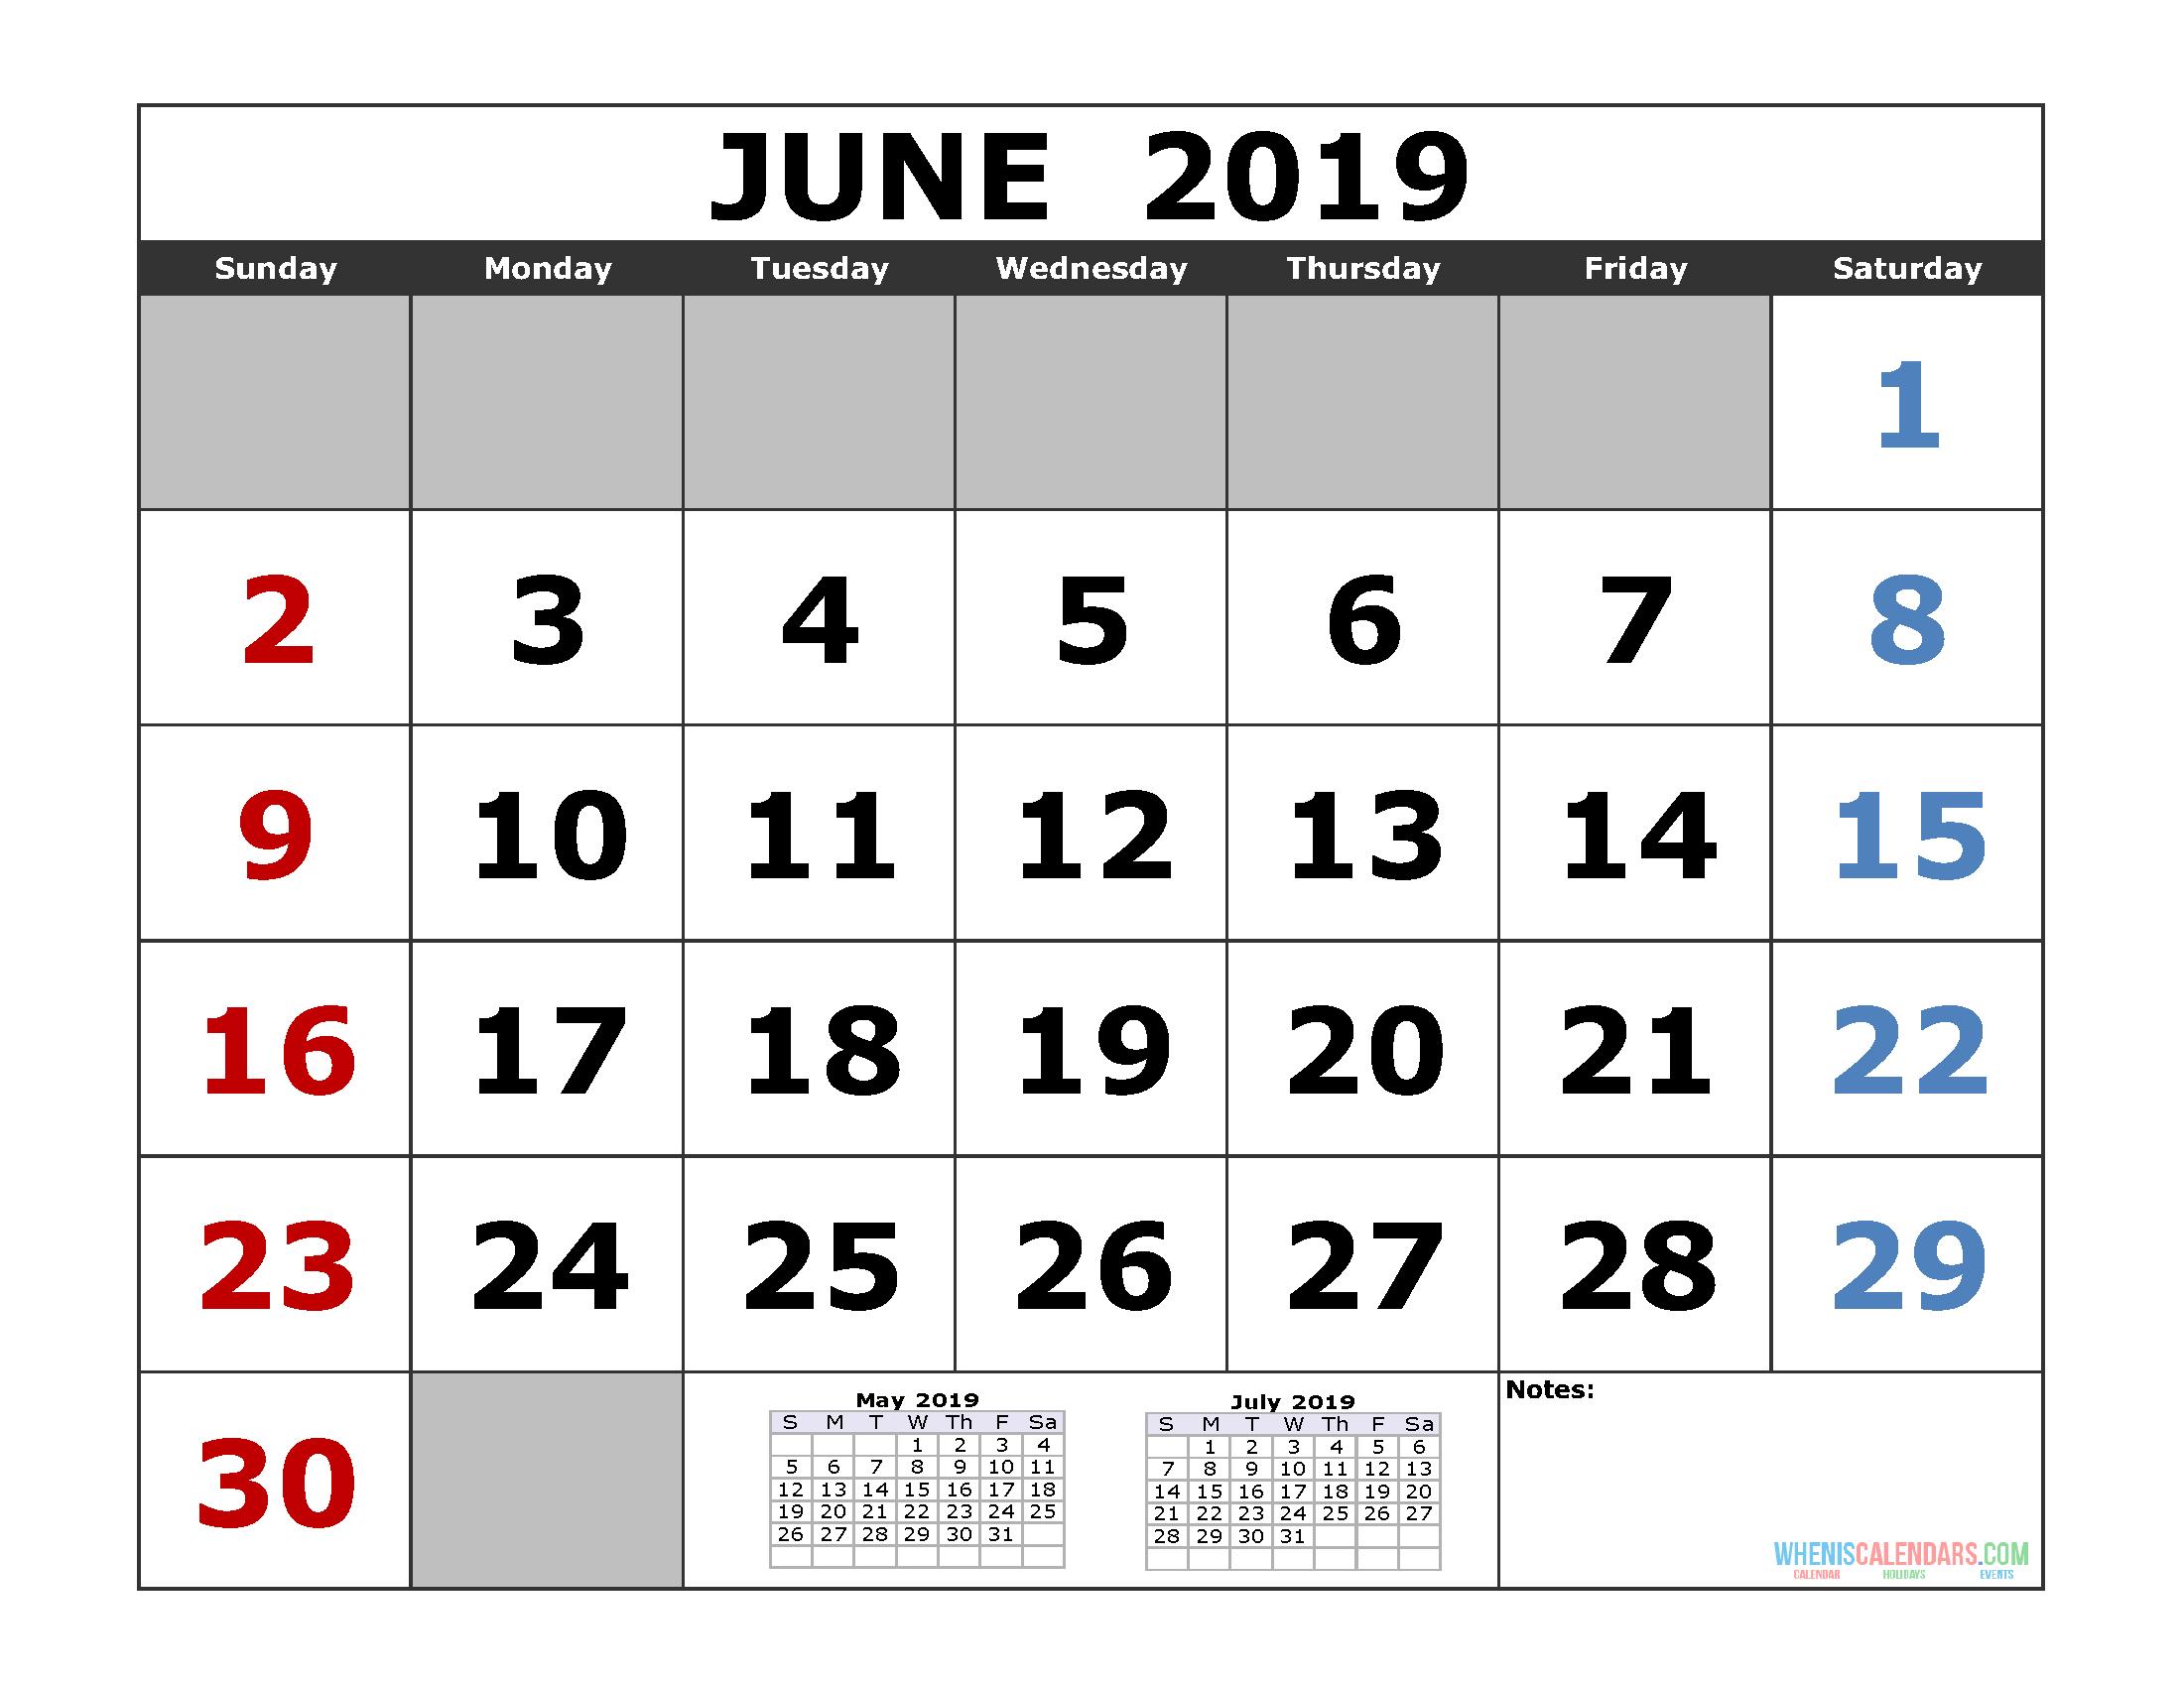 June 2019 Printable Calendar Template (3 Month Calendar) | Free for 3 Month Calendar Templates May June July